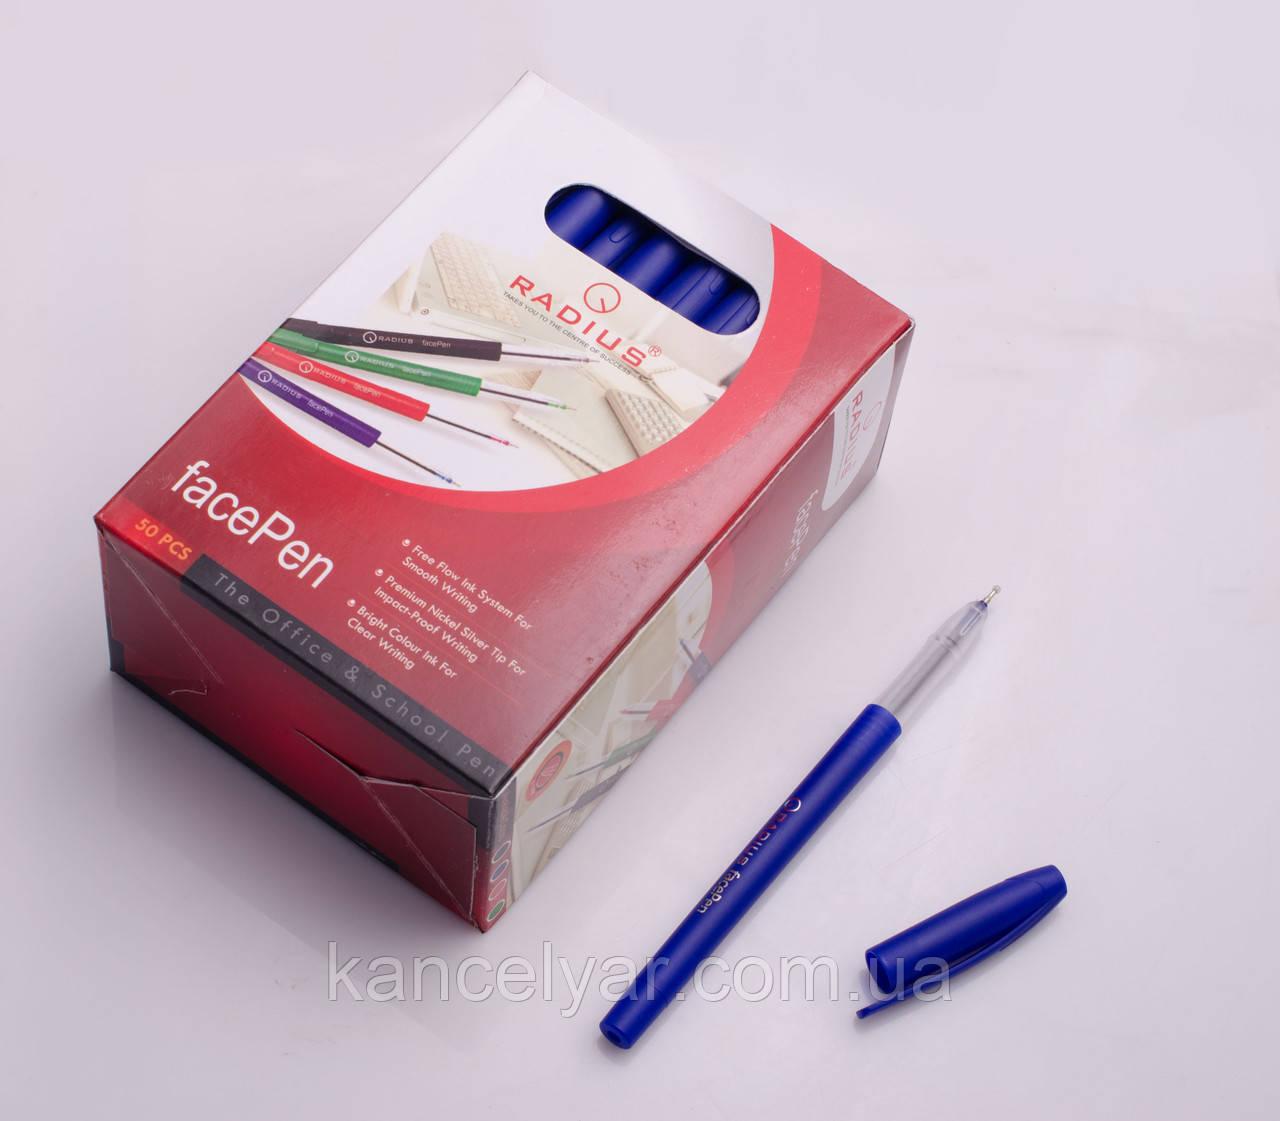 Ручка масляная, 0.7 мм, Radius face Pen